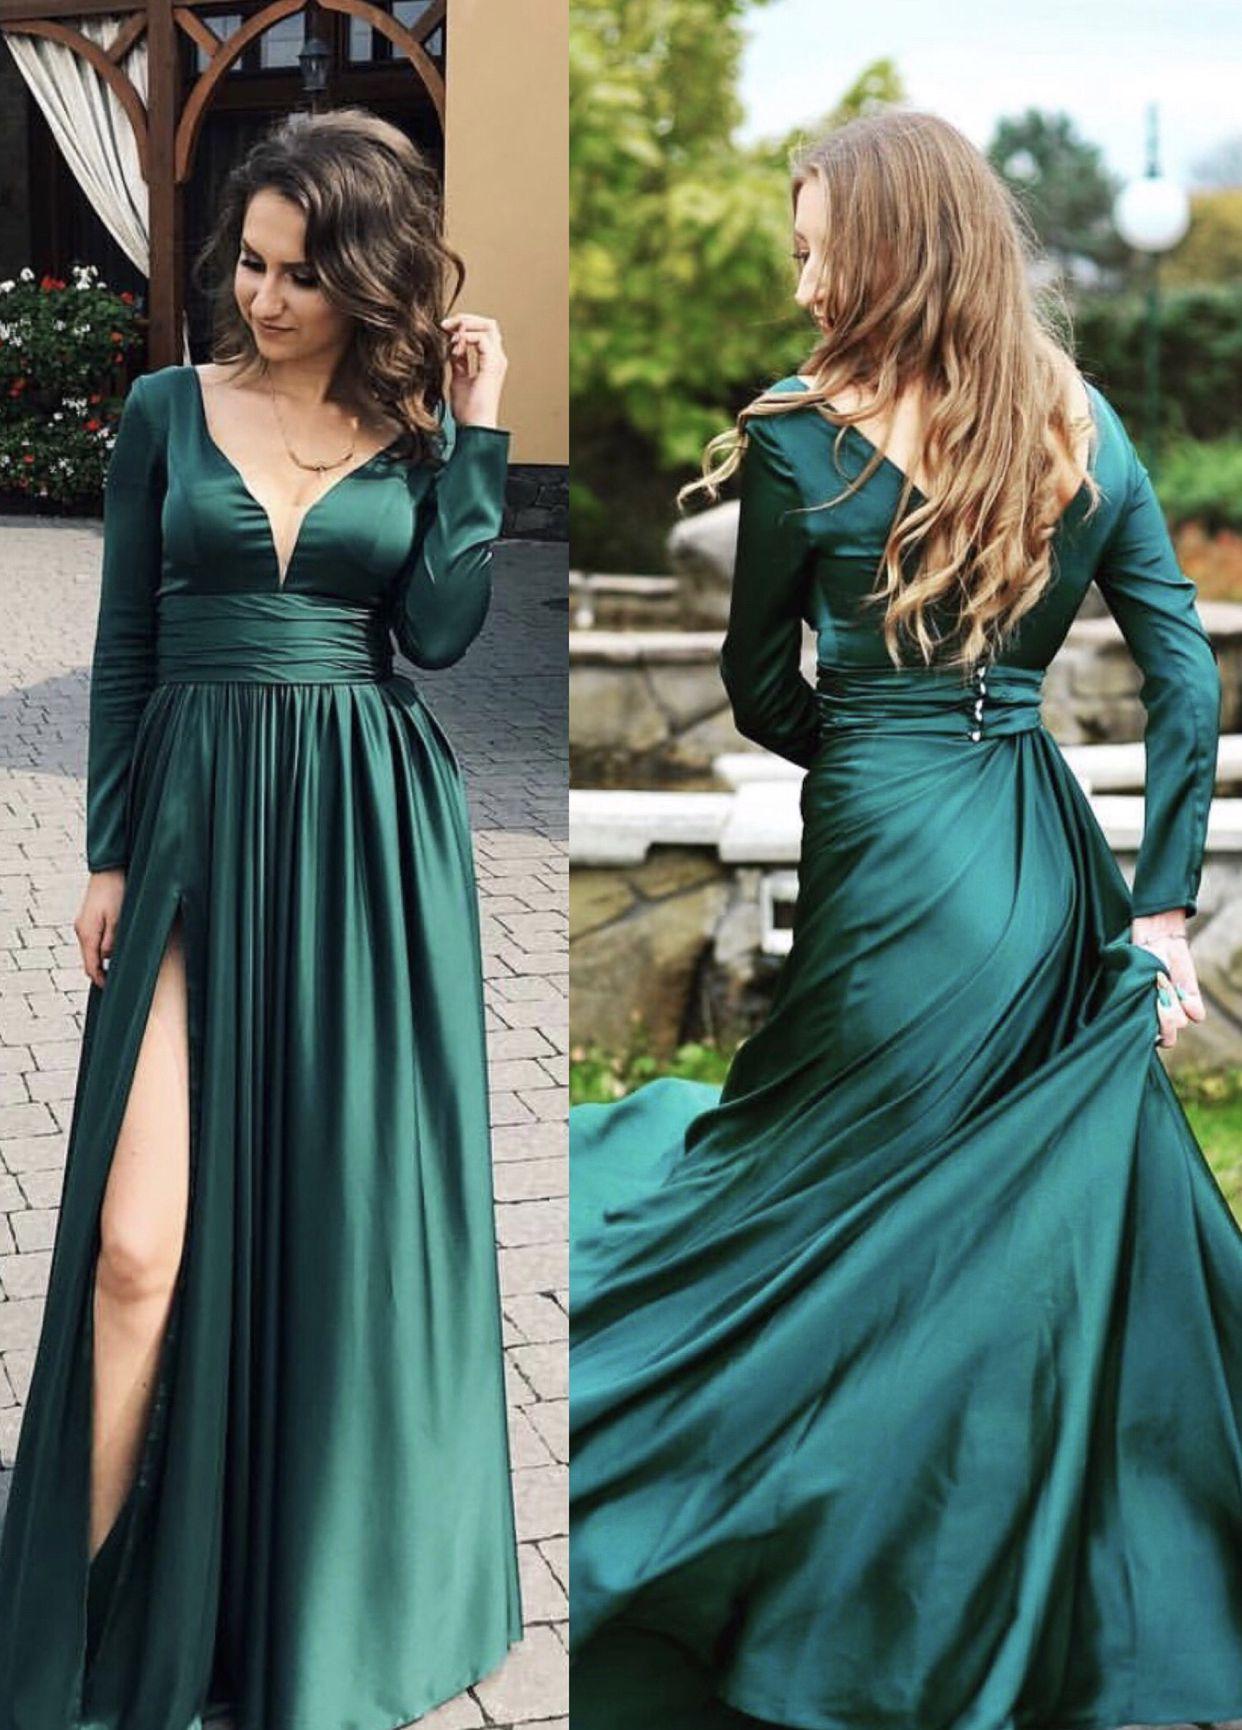 Long Sleeves Evening Dresses Chiffon V Neck Split Prom Dress Prom Dresses Long With Sleeves Green Prom Dress Green Prom Dress Long [ 1730 x 1242 Pixel ]